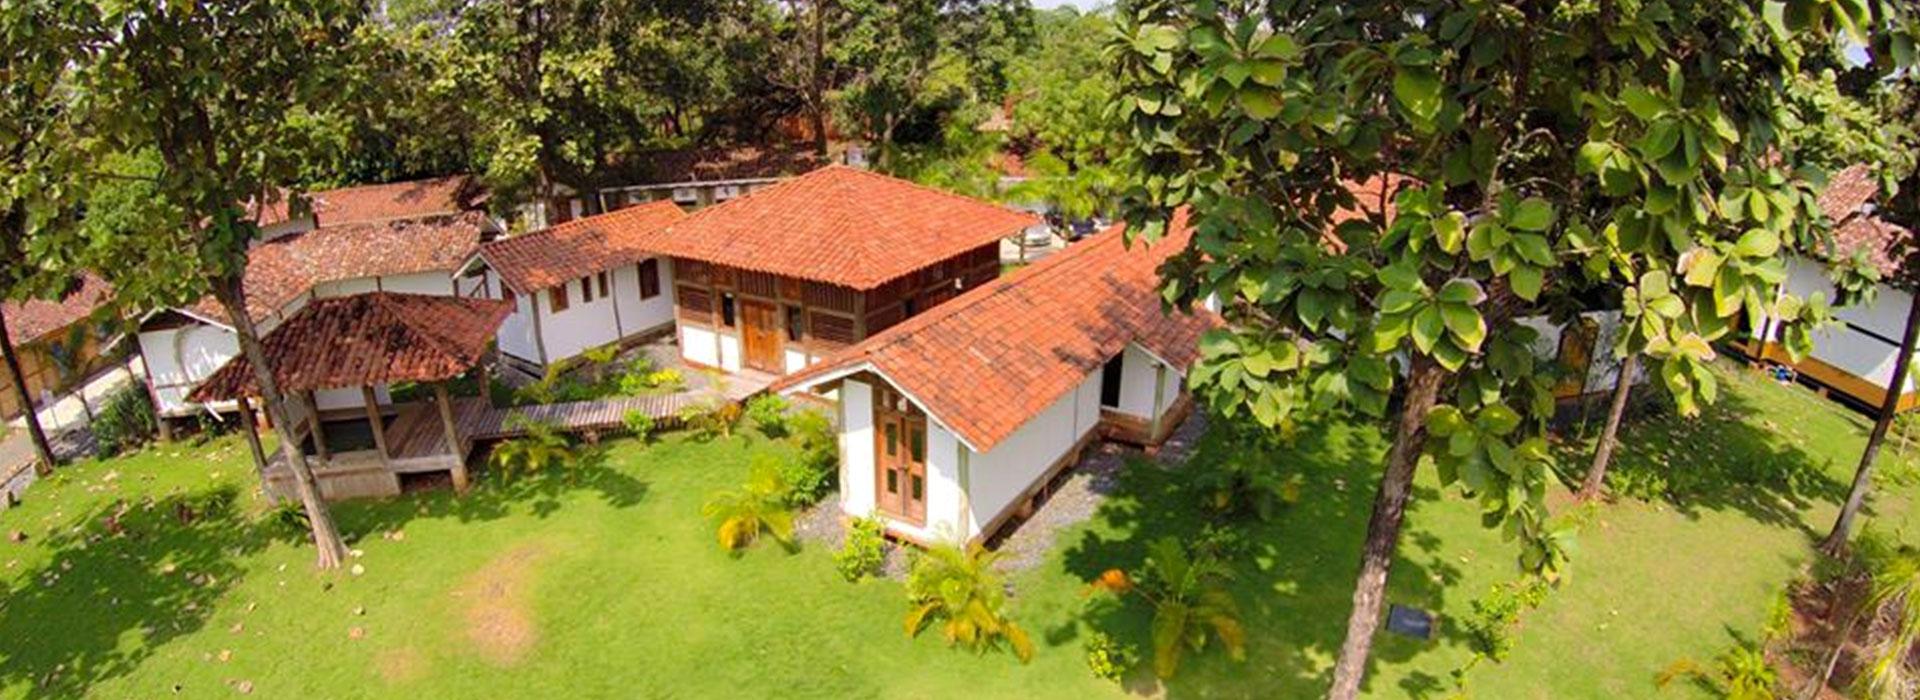 Eco Property, Panama - PAN (photo 1)